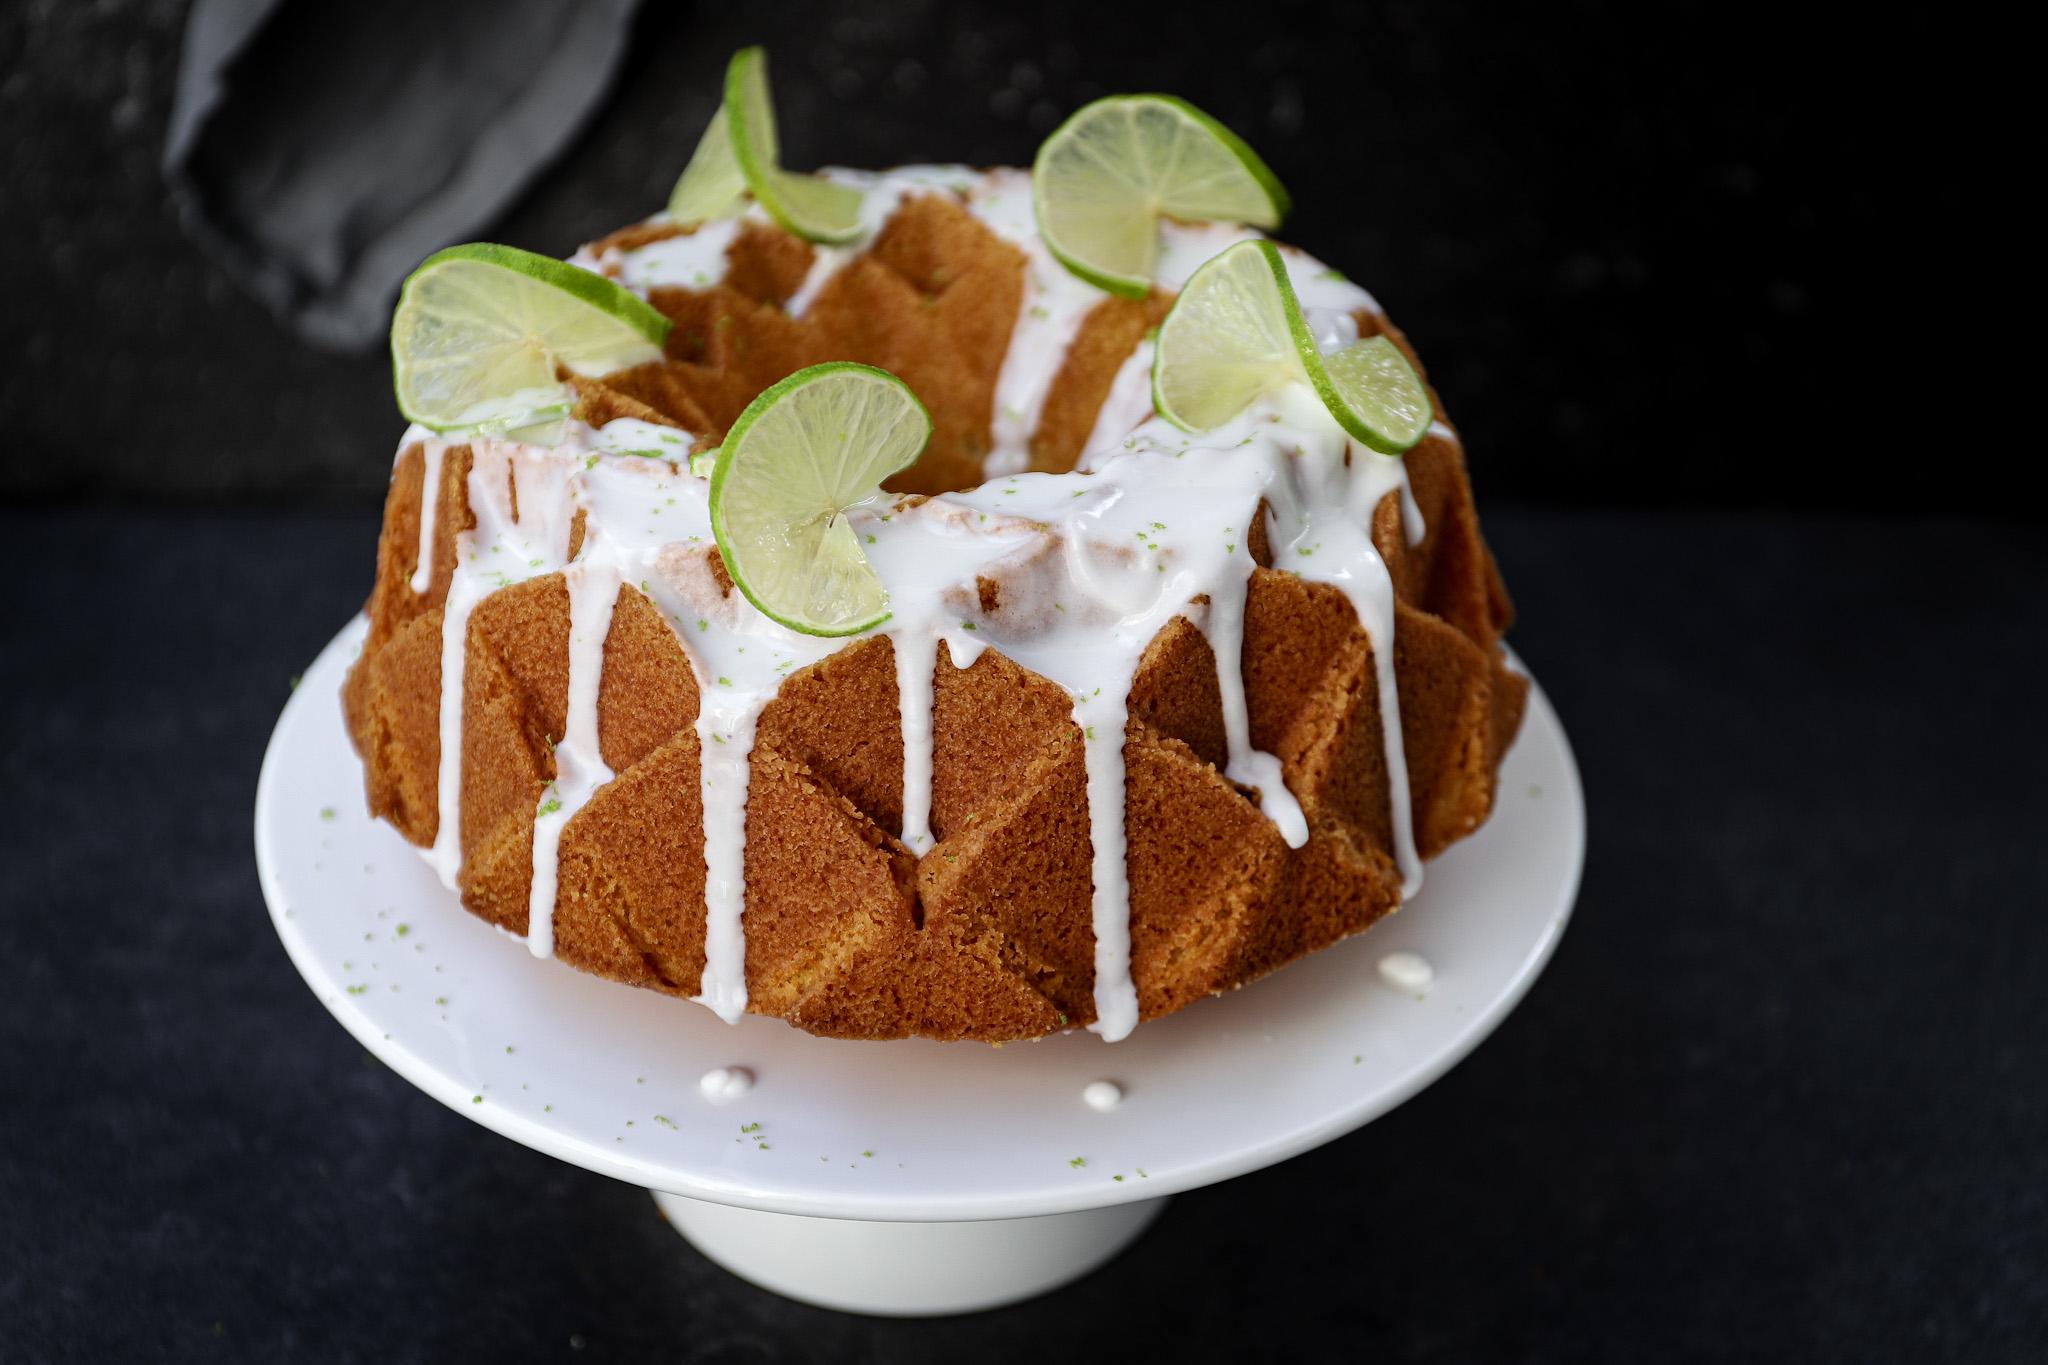 Ginger beer cake met limoenglazuur